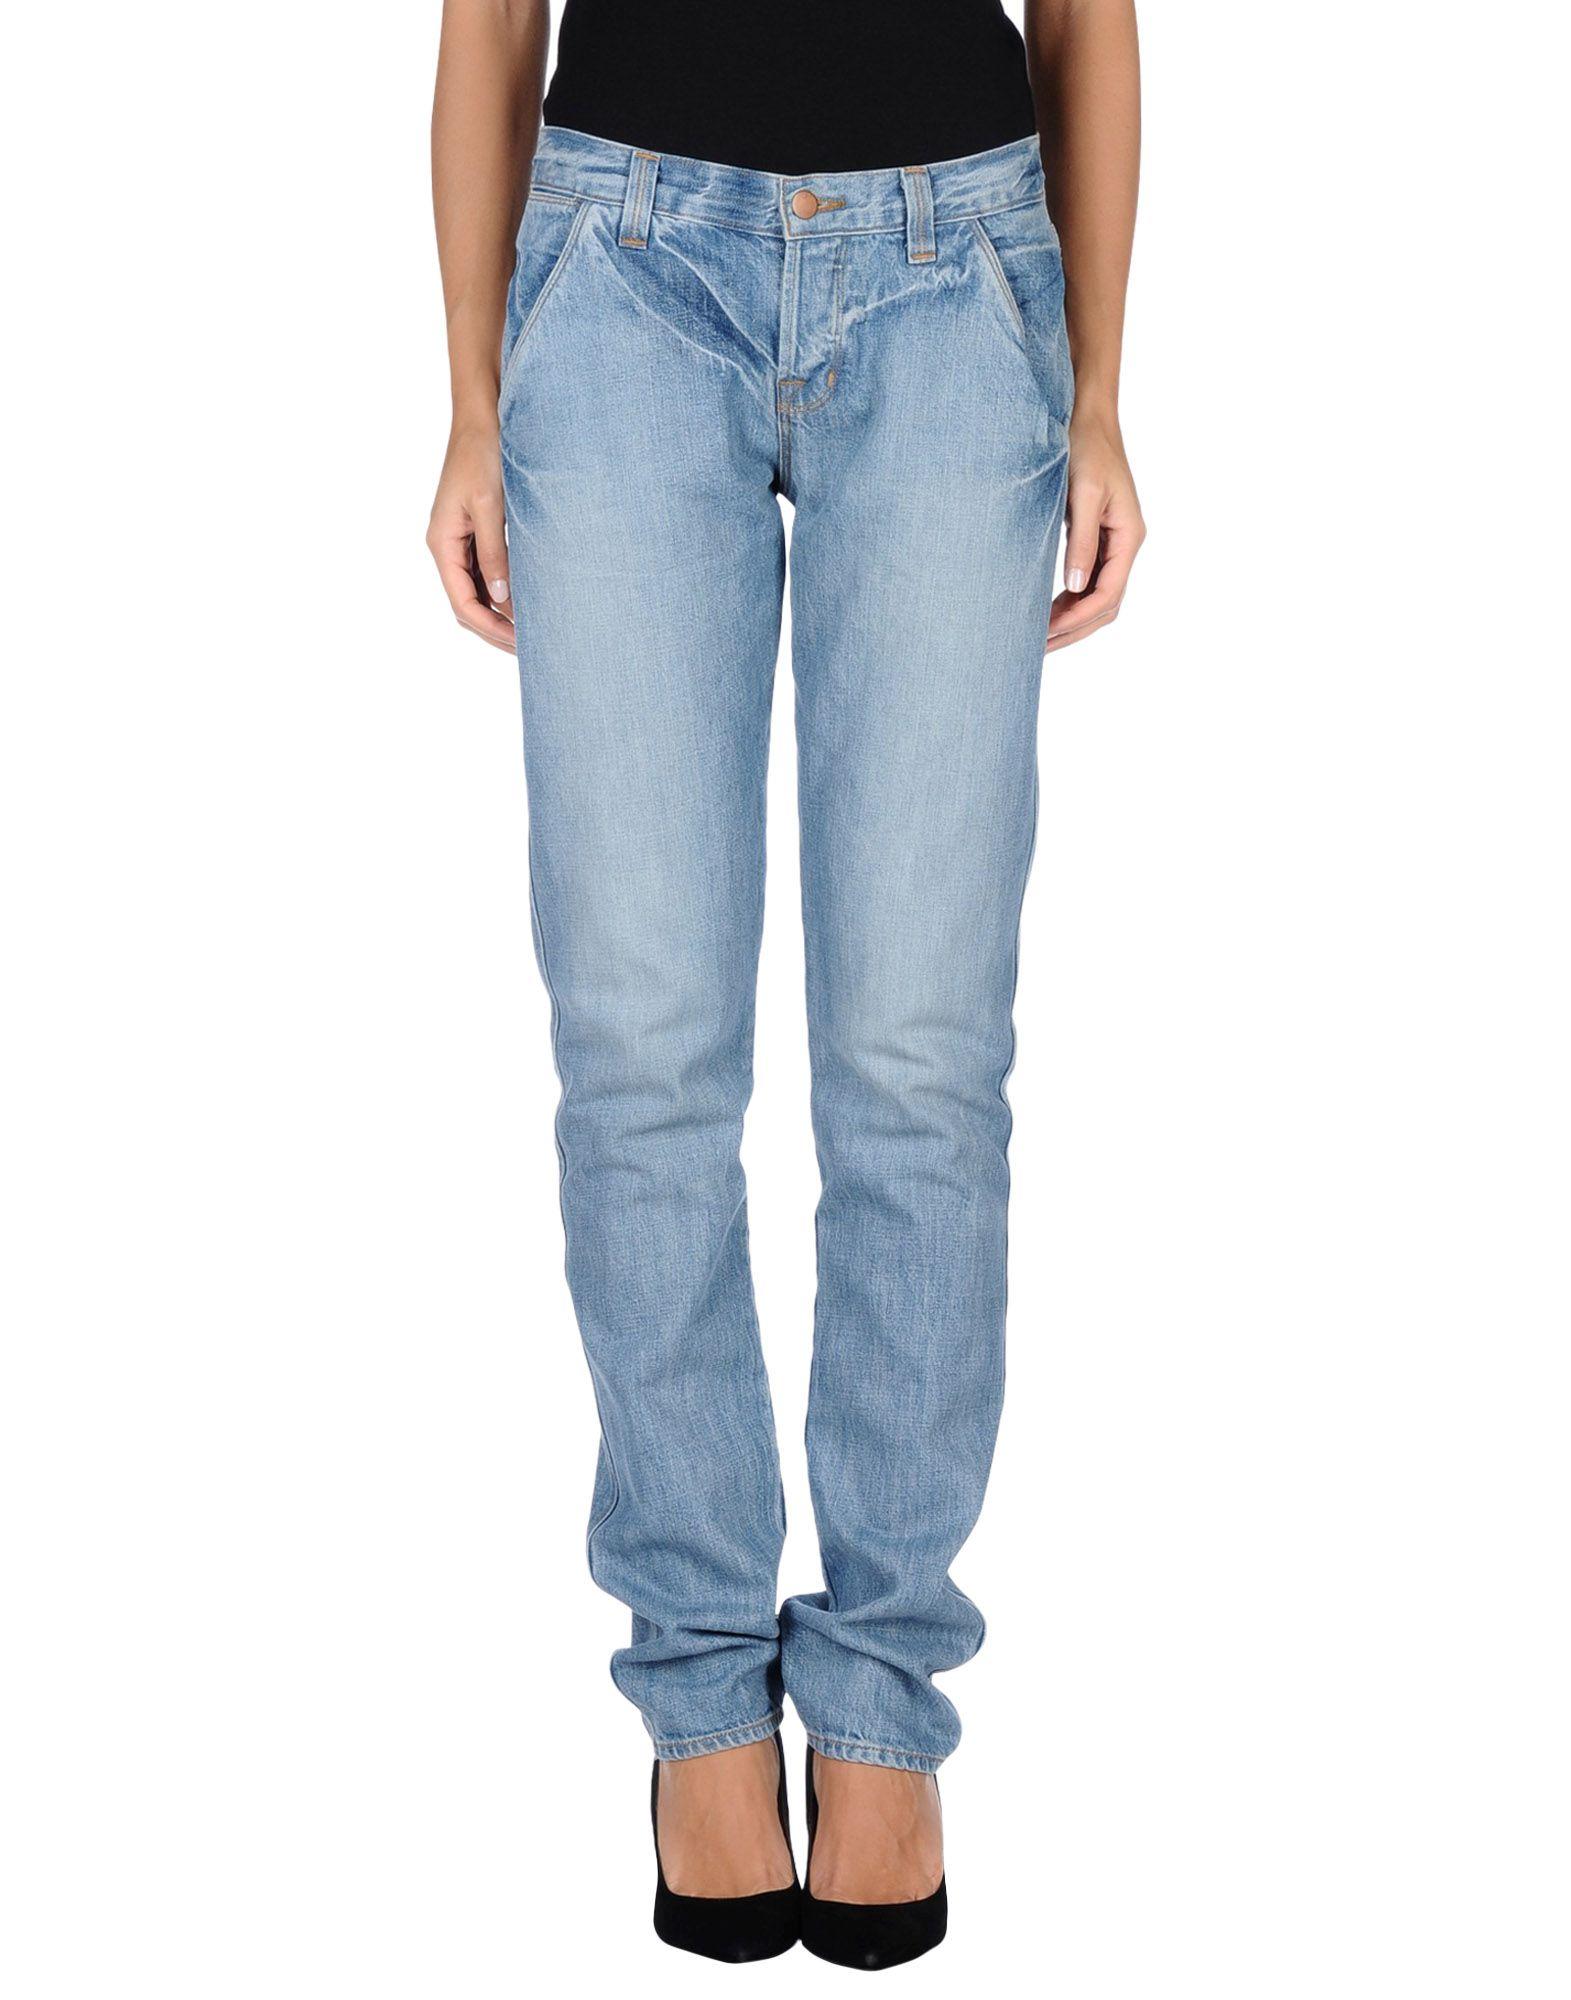 Pantaloni Jeans J Brand Donna - Acquista online su 8VZW9gYMr